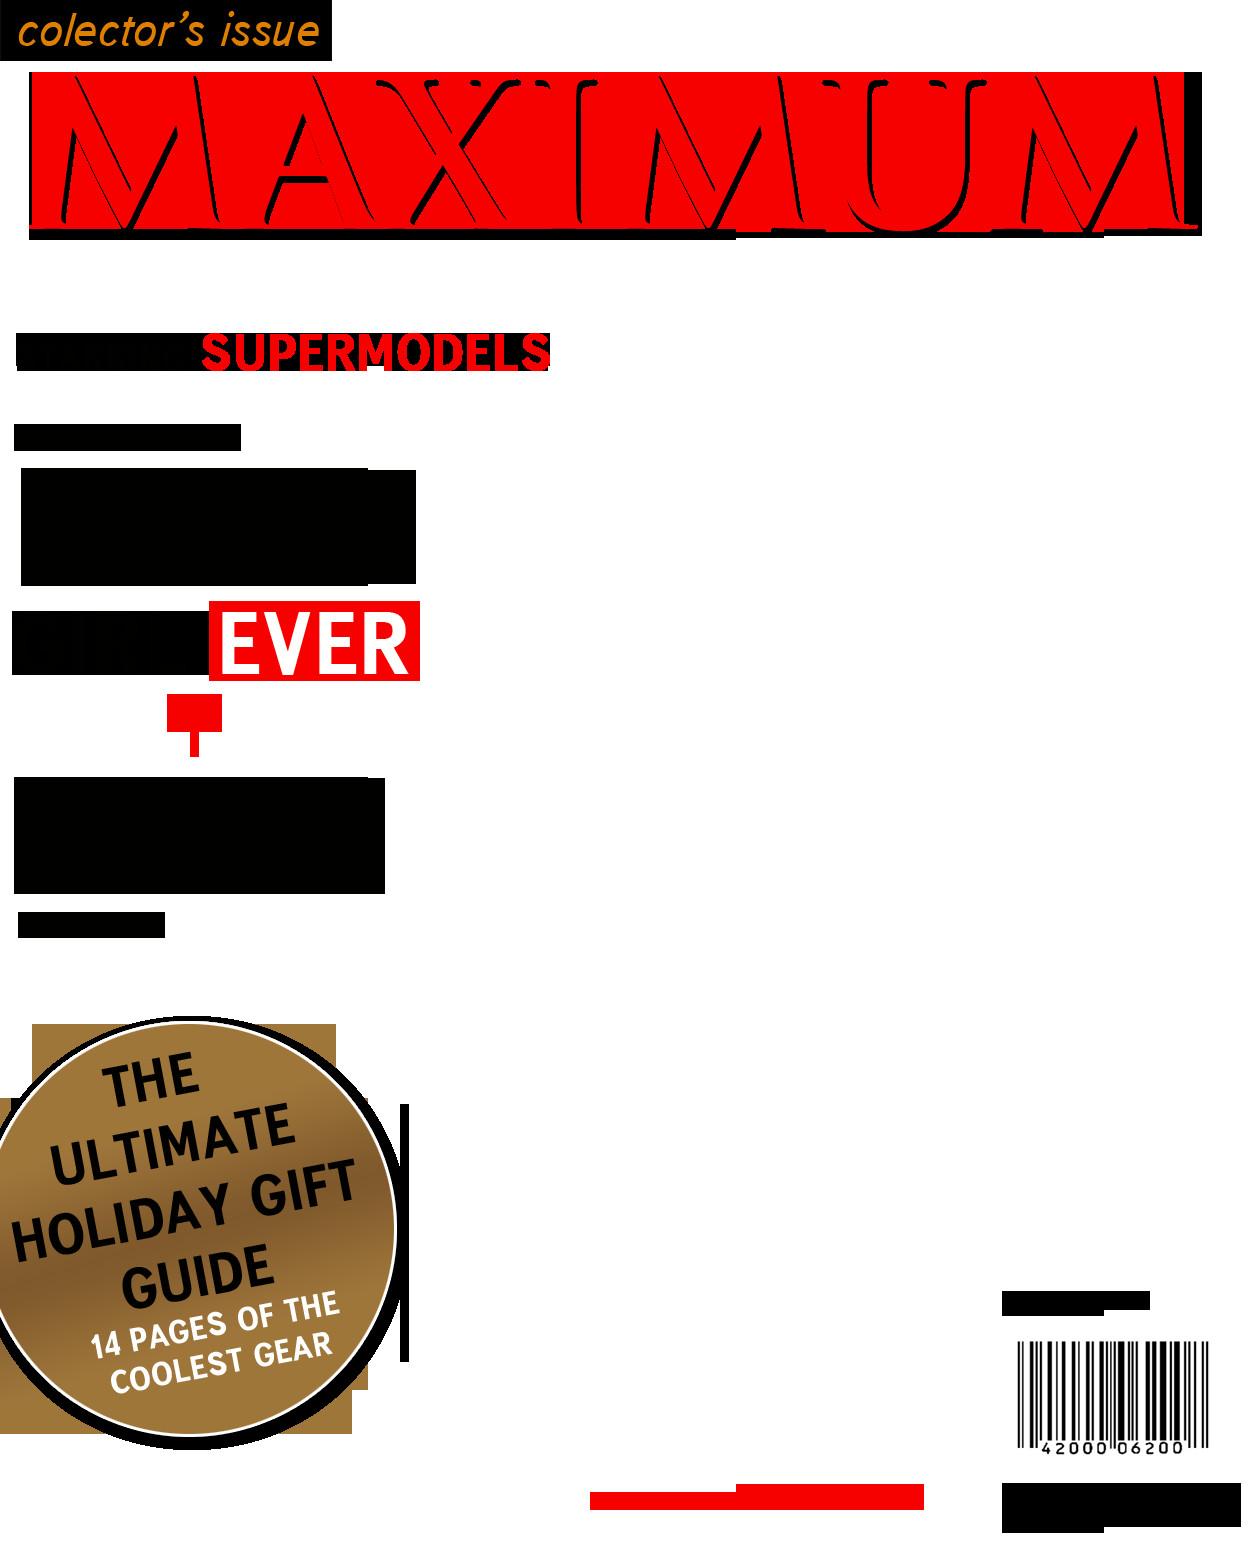 Free Personalized Magazine Covers Templates Inmagazines Fake Magazine Cover Generator